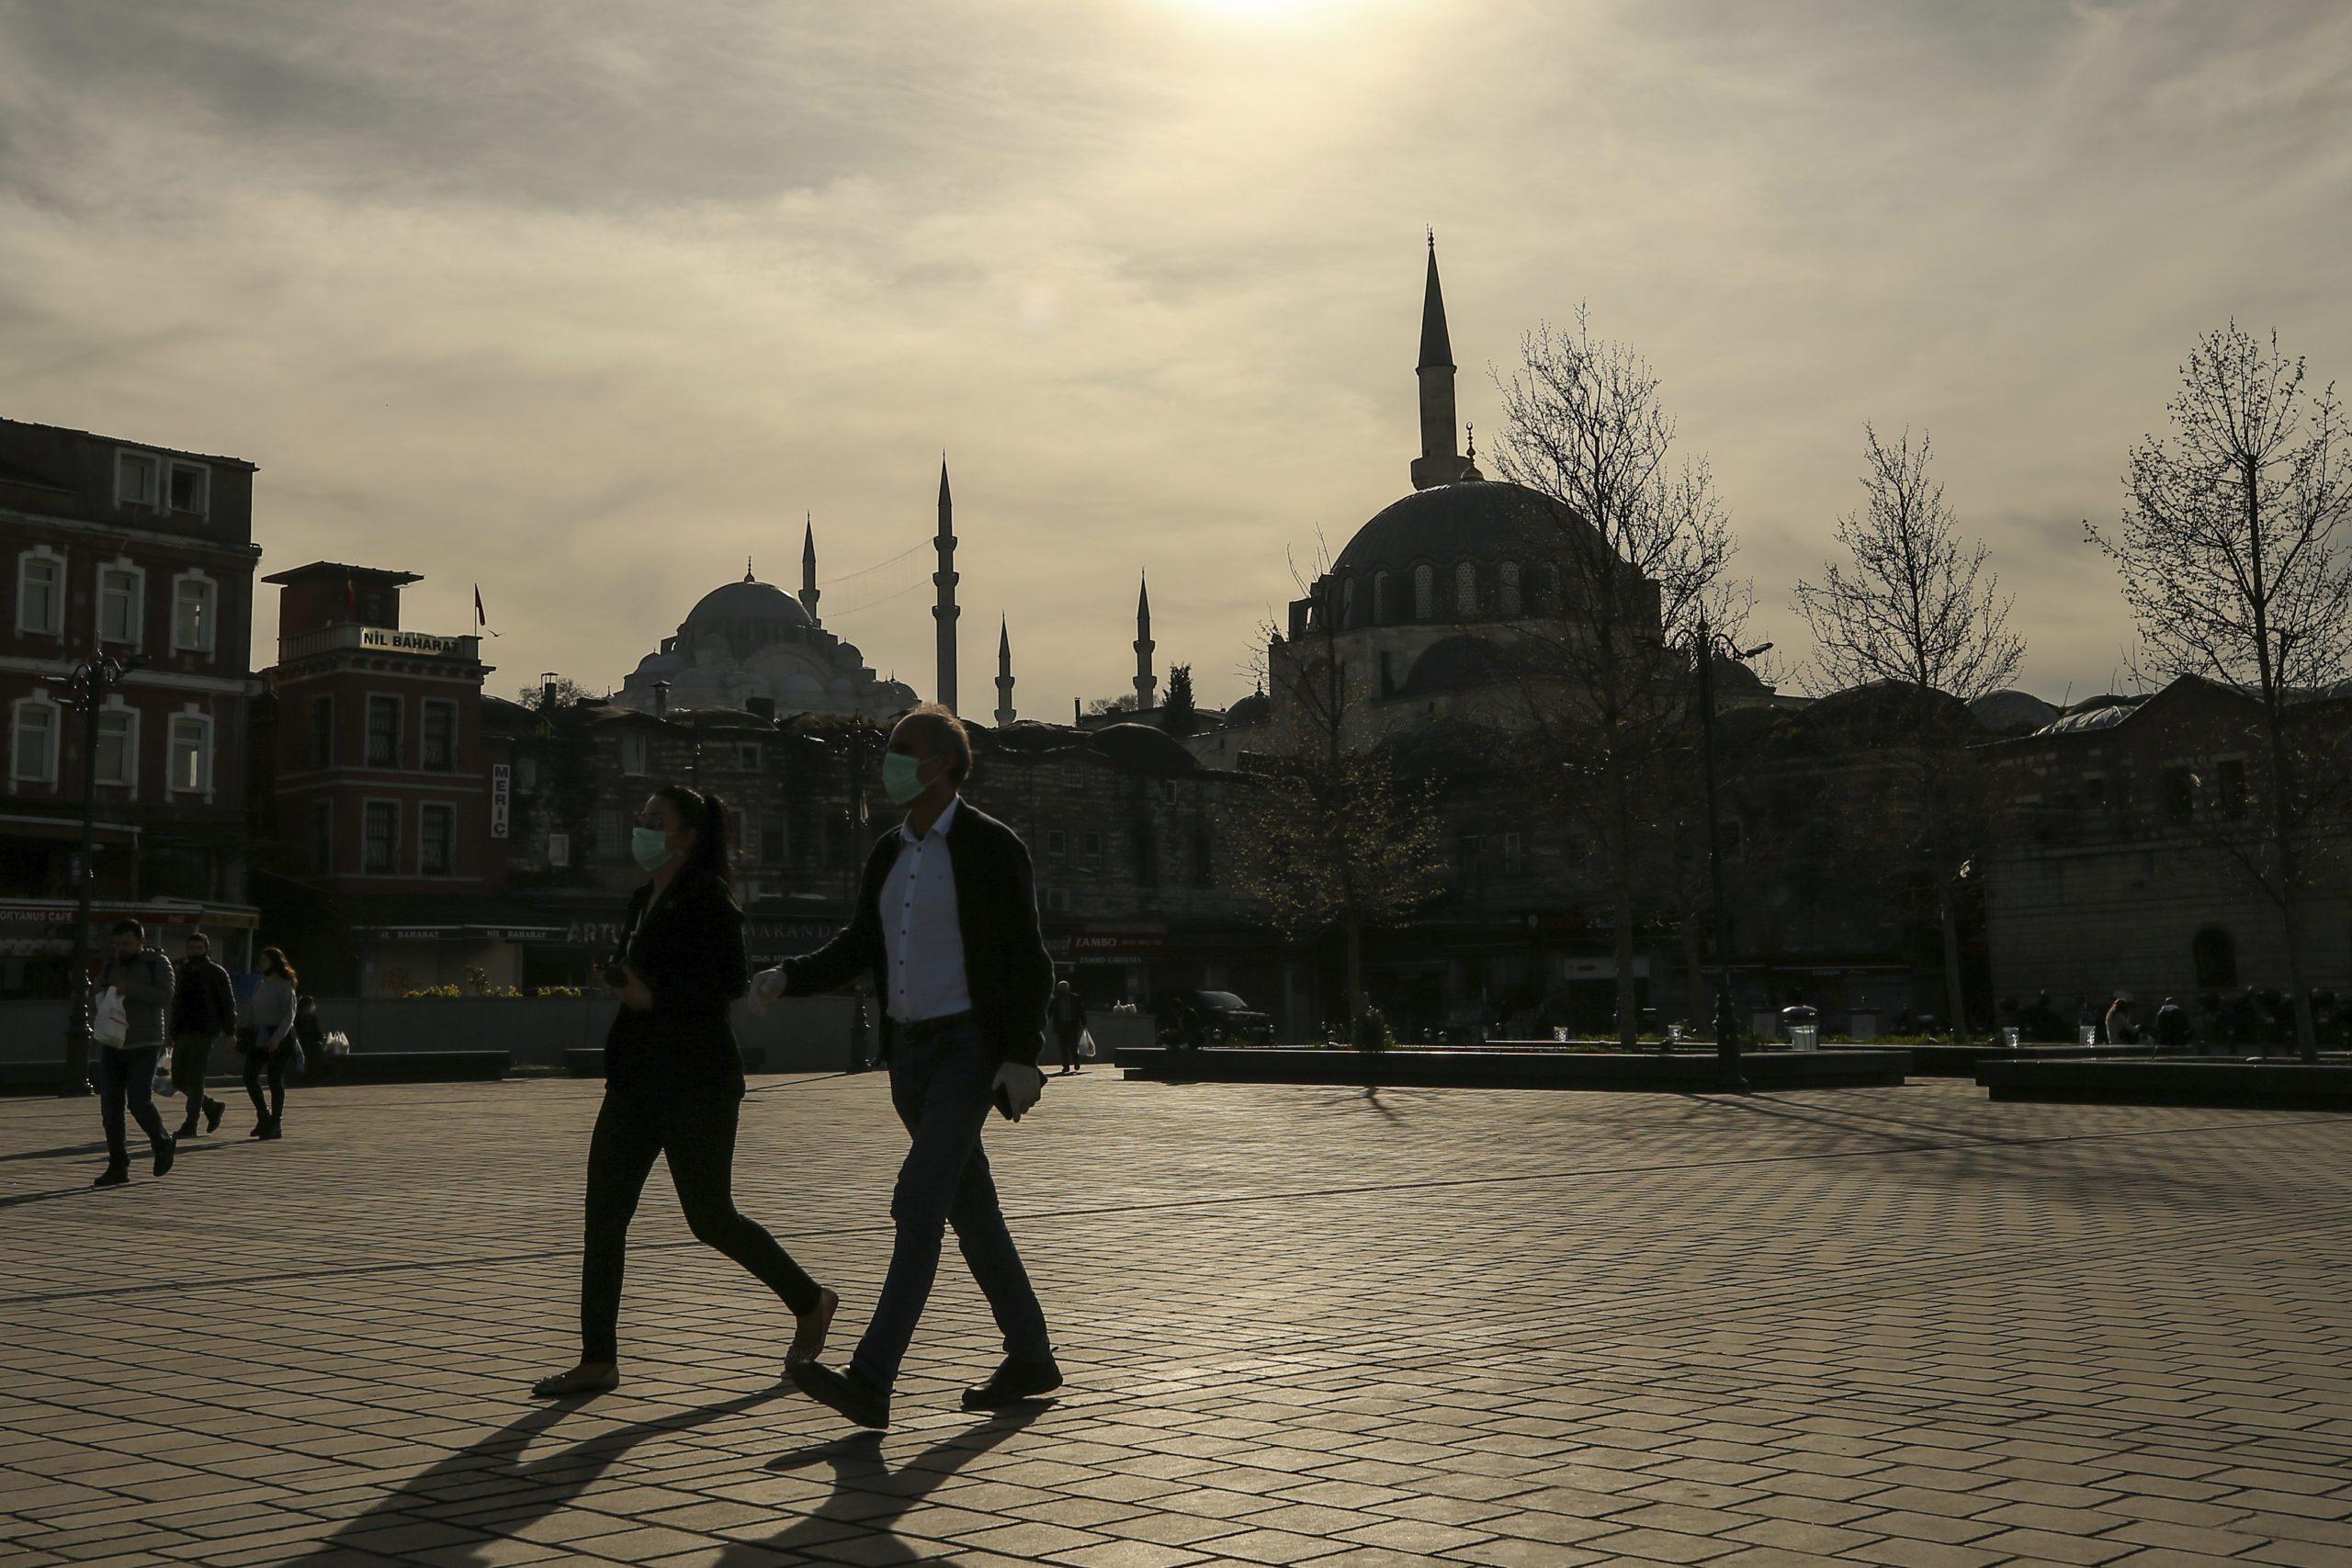 turska:-umrle-44-osobe-nakon-konzumacije-laznog-alkohola